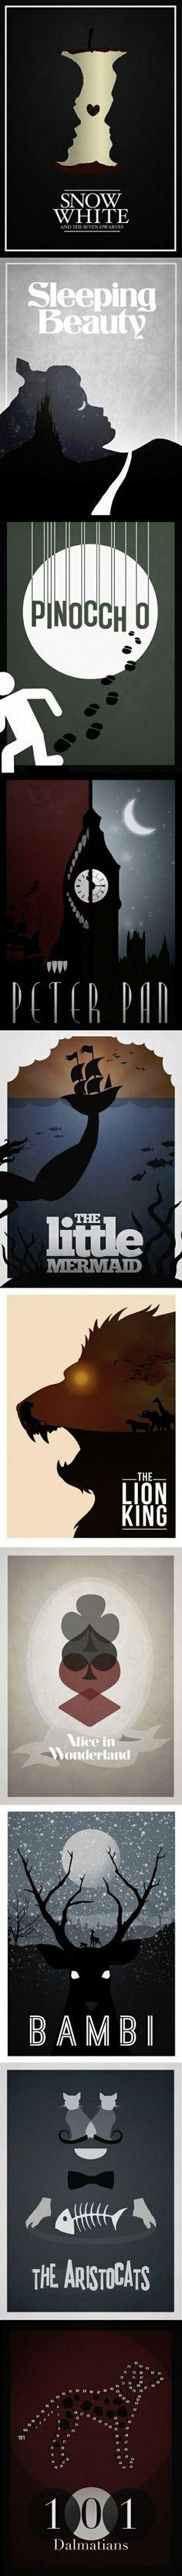 Simplistic Disney posters.